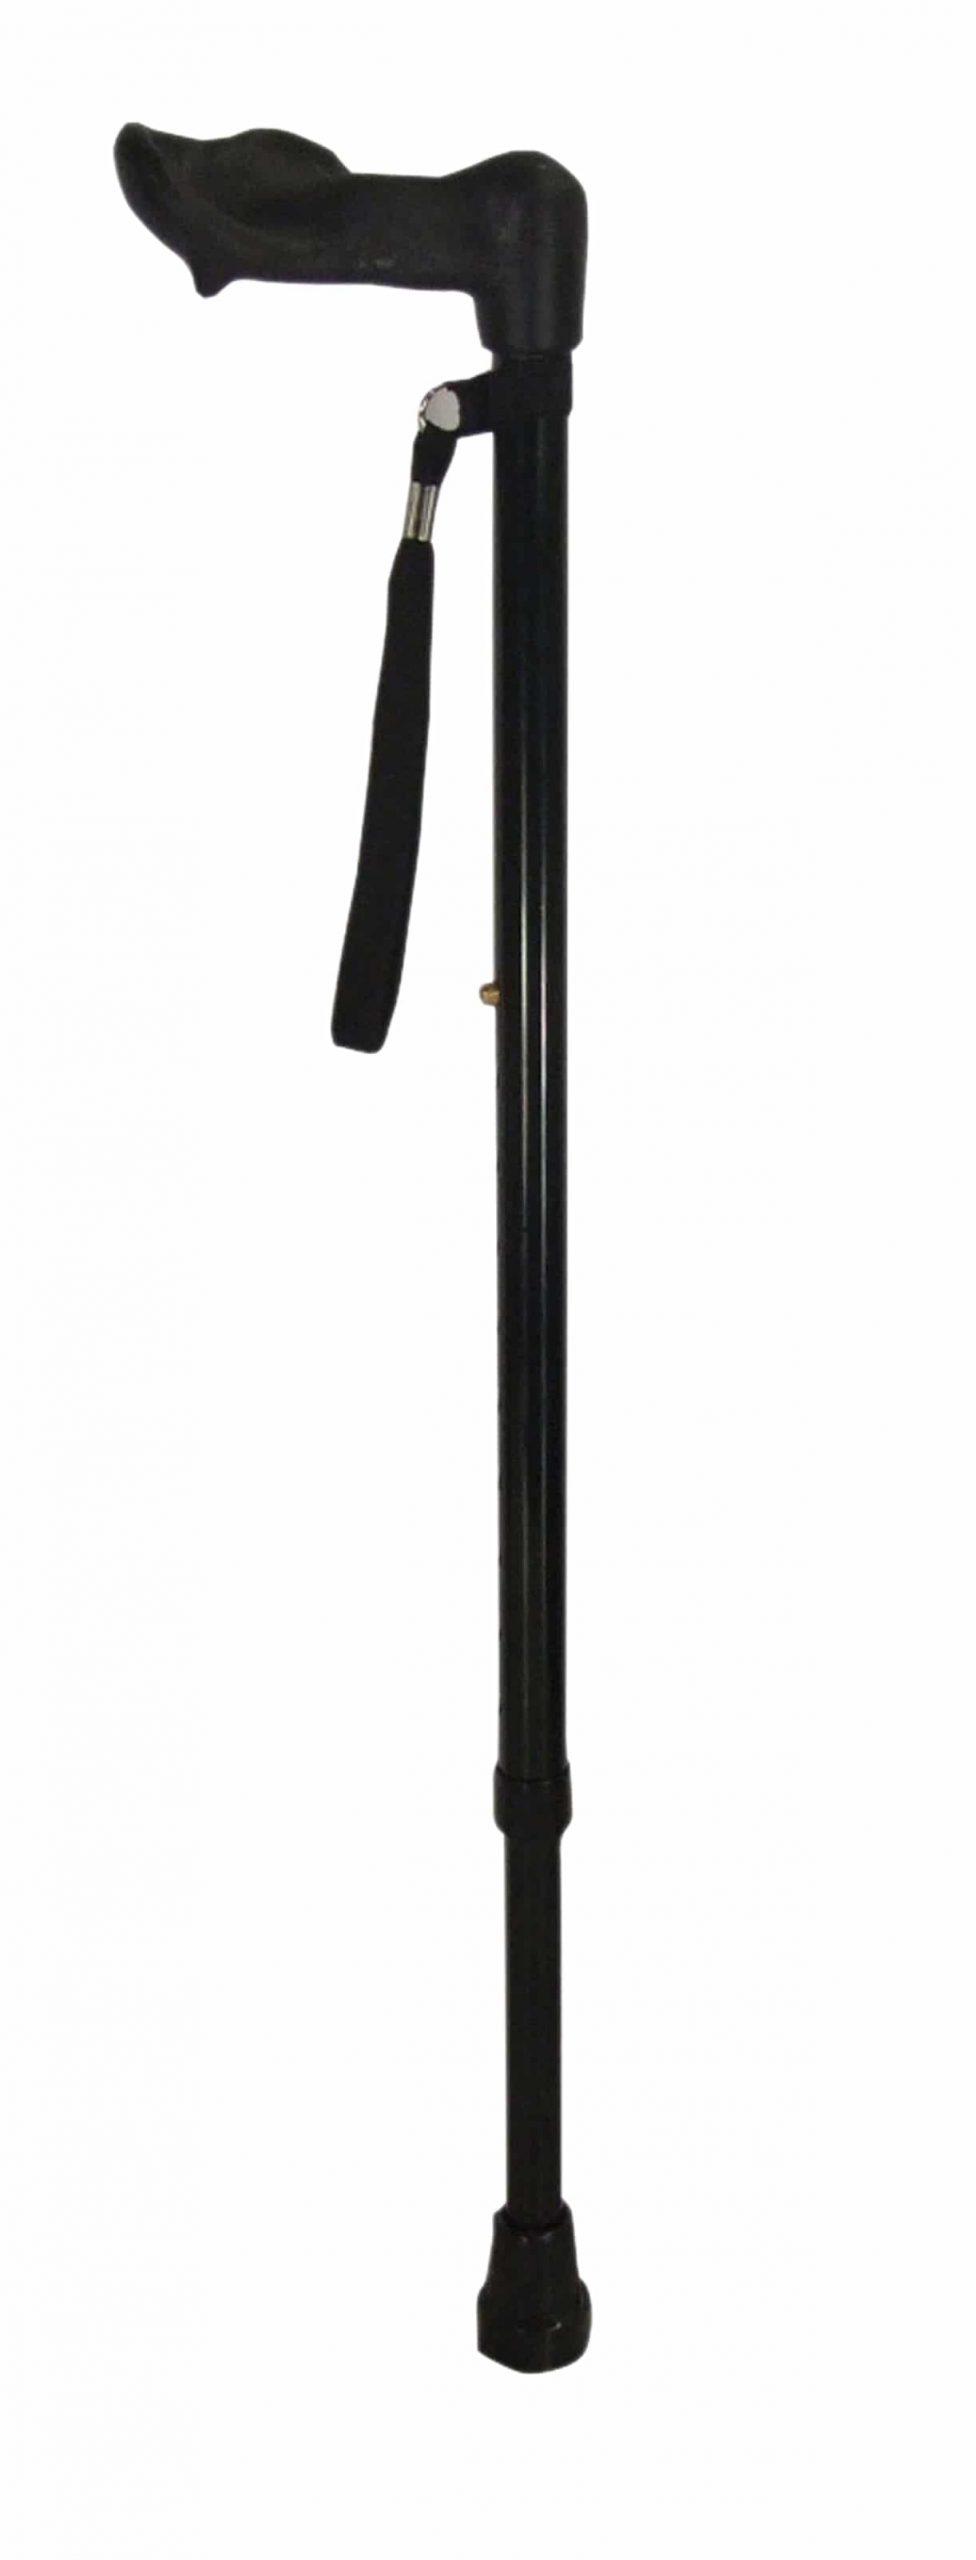 Ergonomic Handled Walking Stick - Right Handed